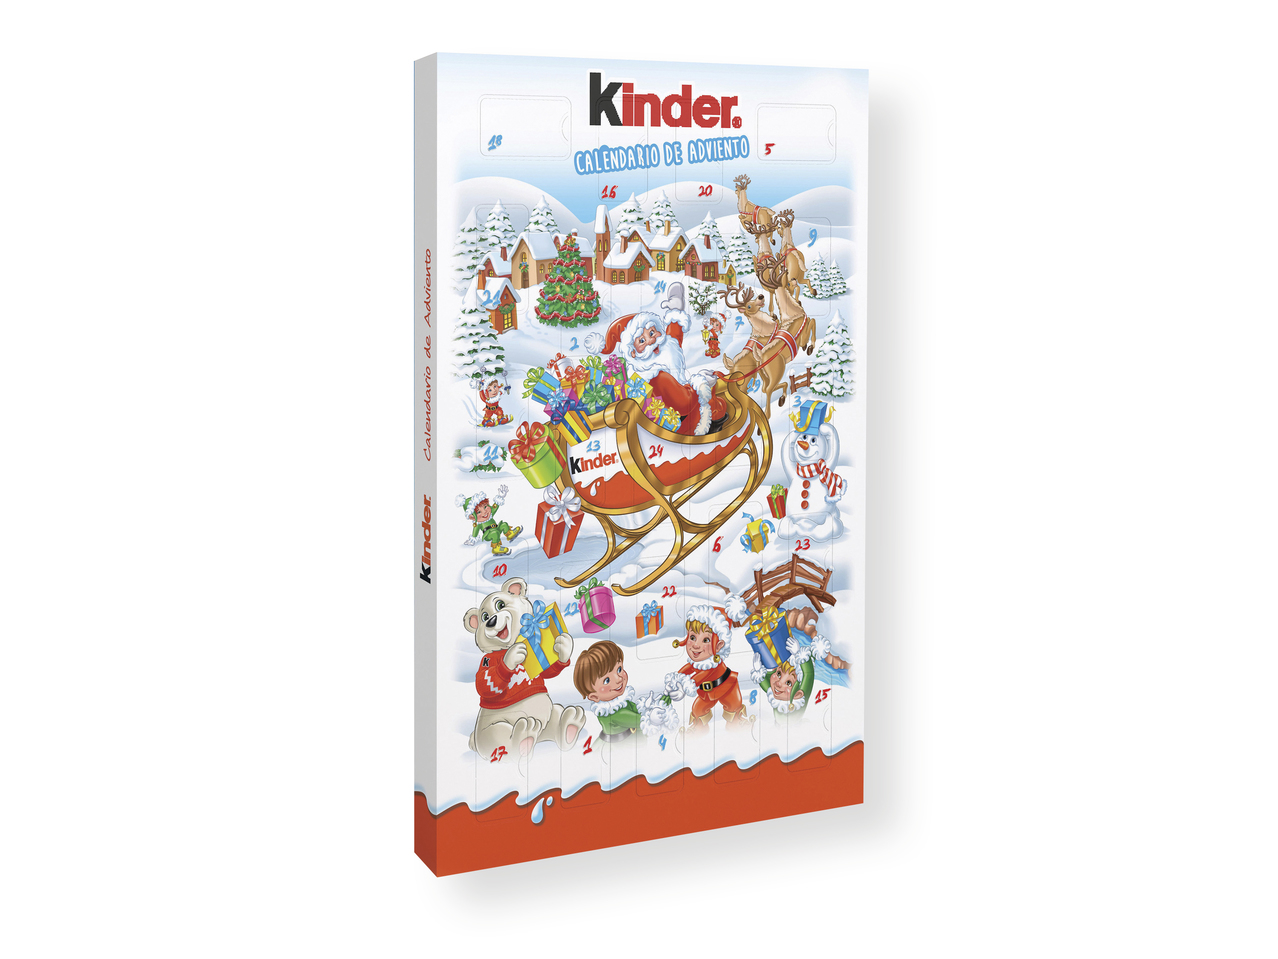 Calendario Adviento Lidl.Kinder R Calendario De Adviento Lidl Espana Specials Archive